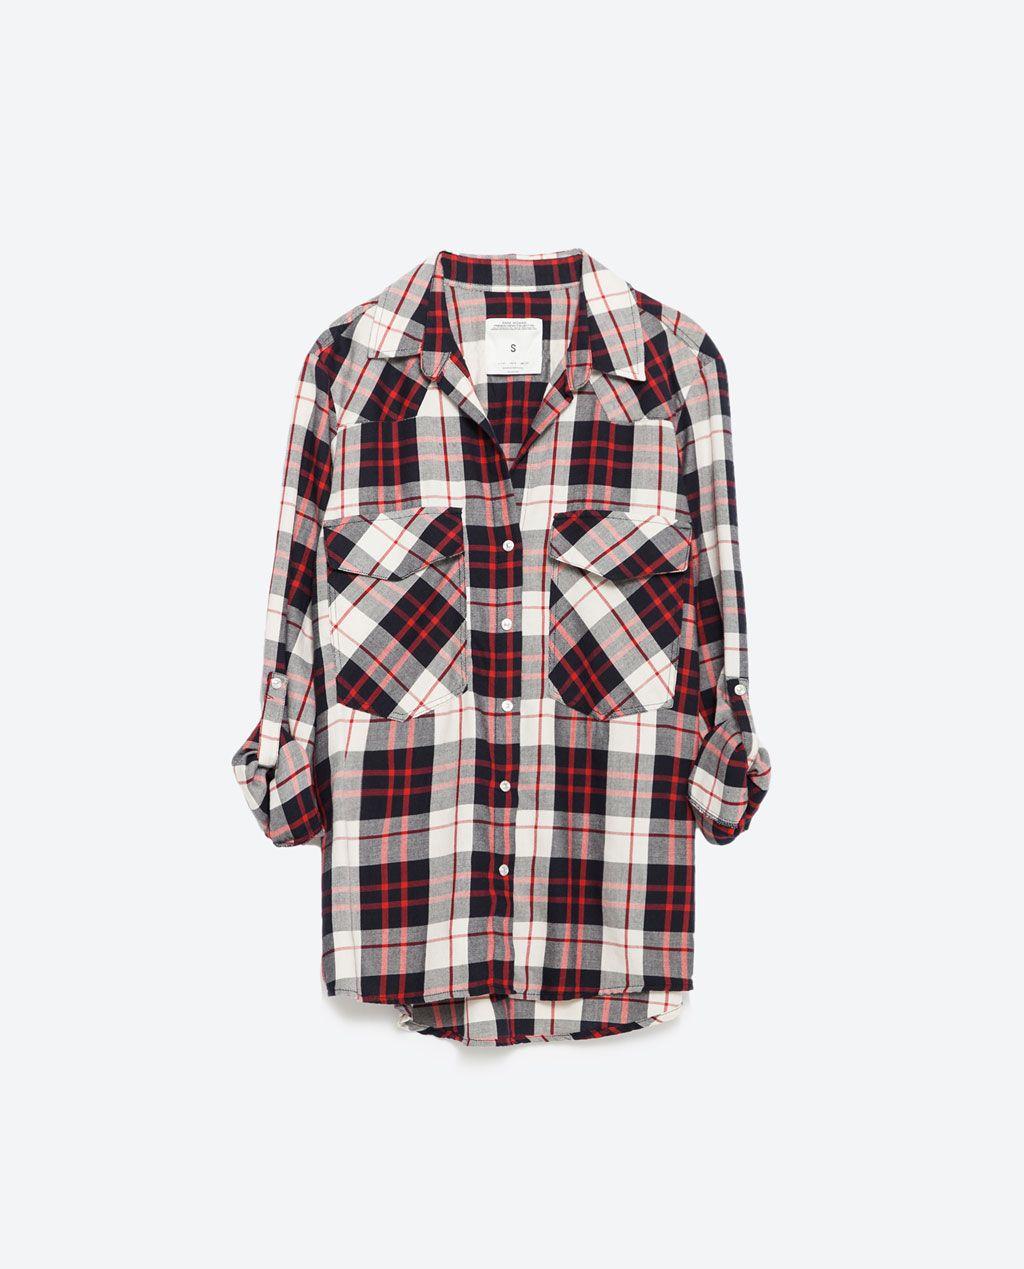 chemise carreaux tout voir chemises femme zara france mode pinterest chemise femme. Black Bedroom Furniture Sets. Home Design Ideas